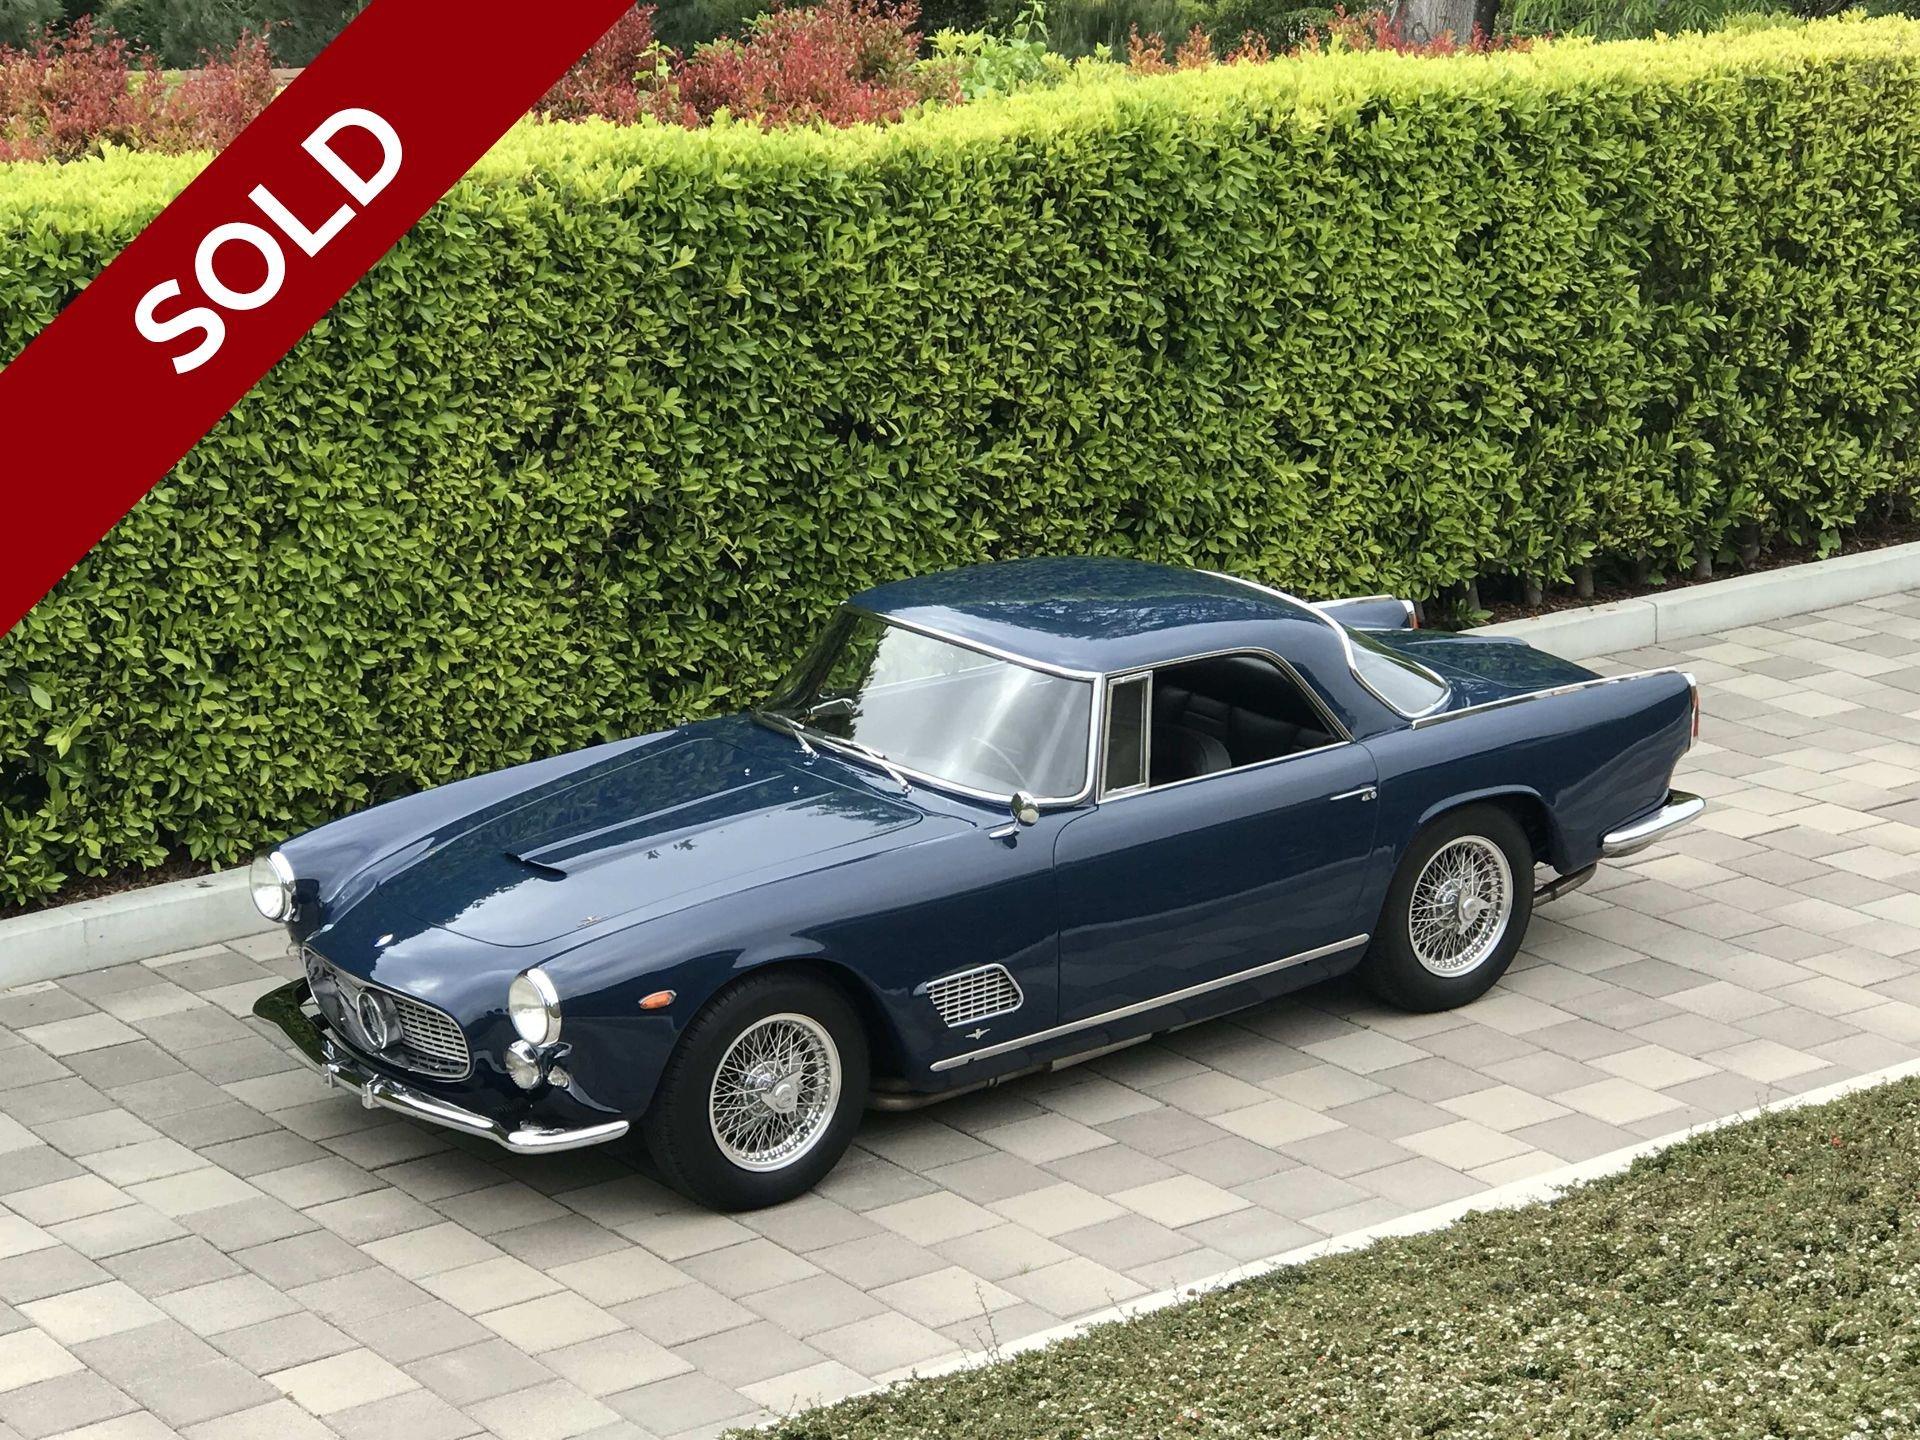 Sold 1961 maserati 3500gt